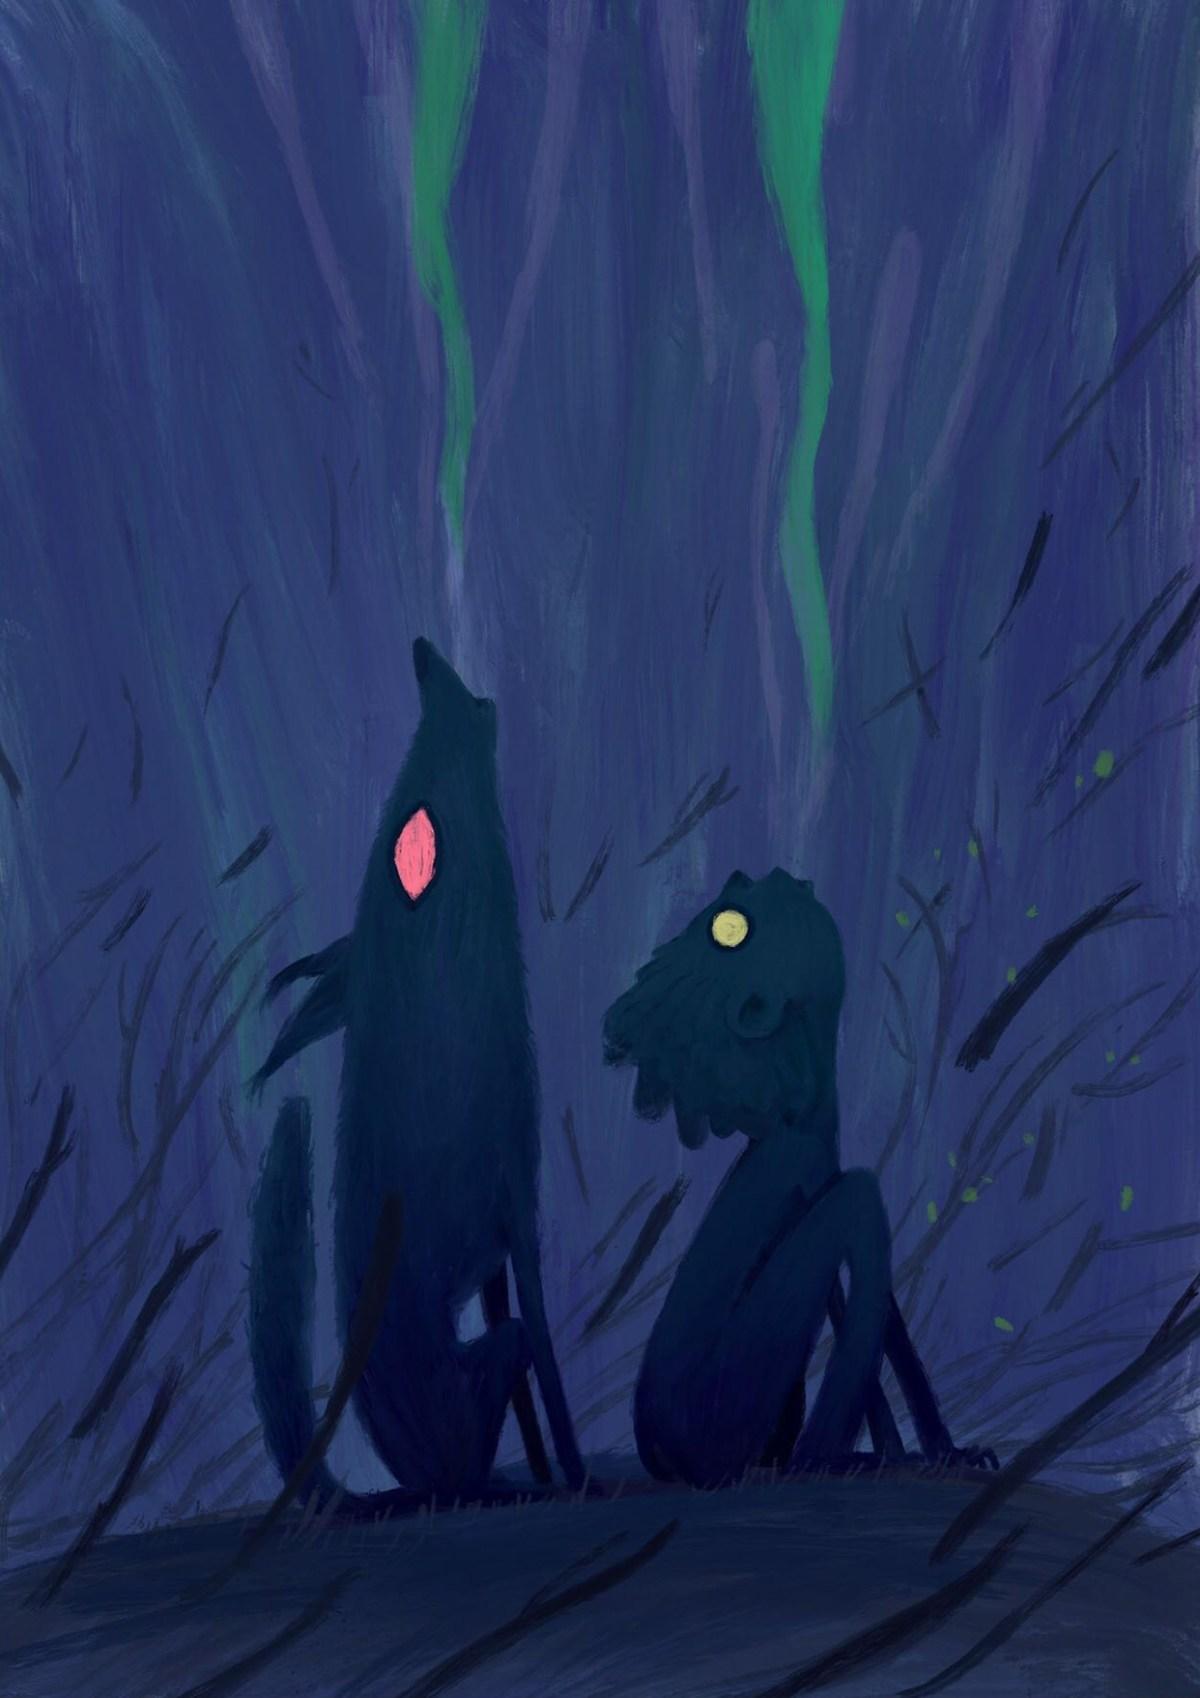 childhoodWeek-moss-and-fog-5